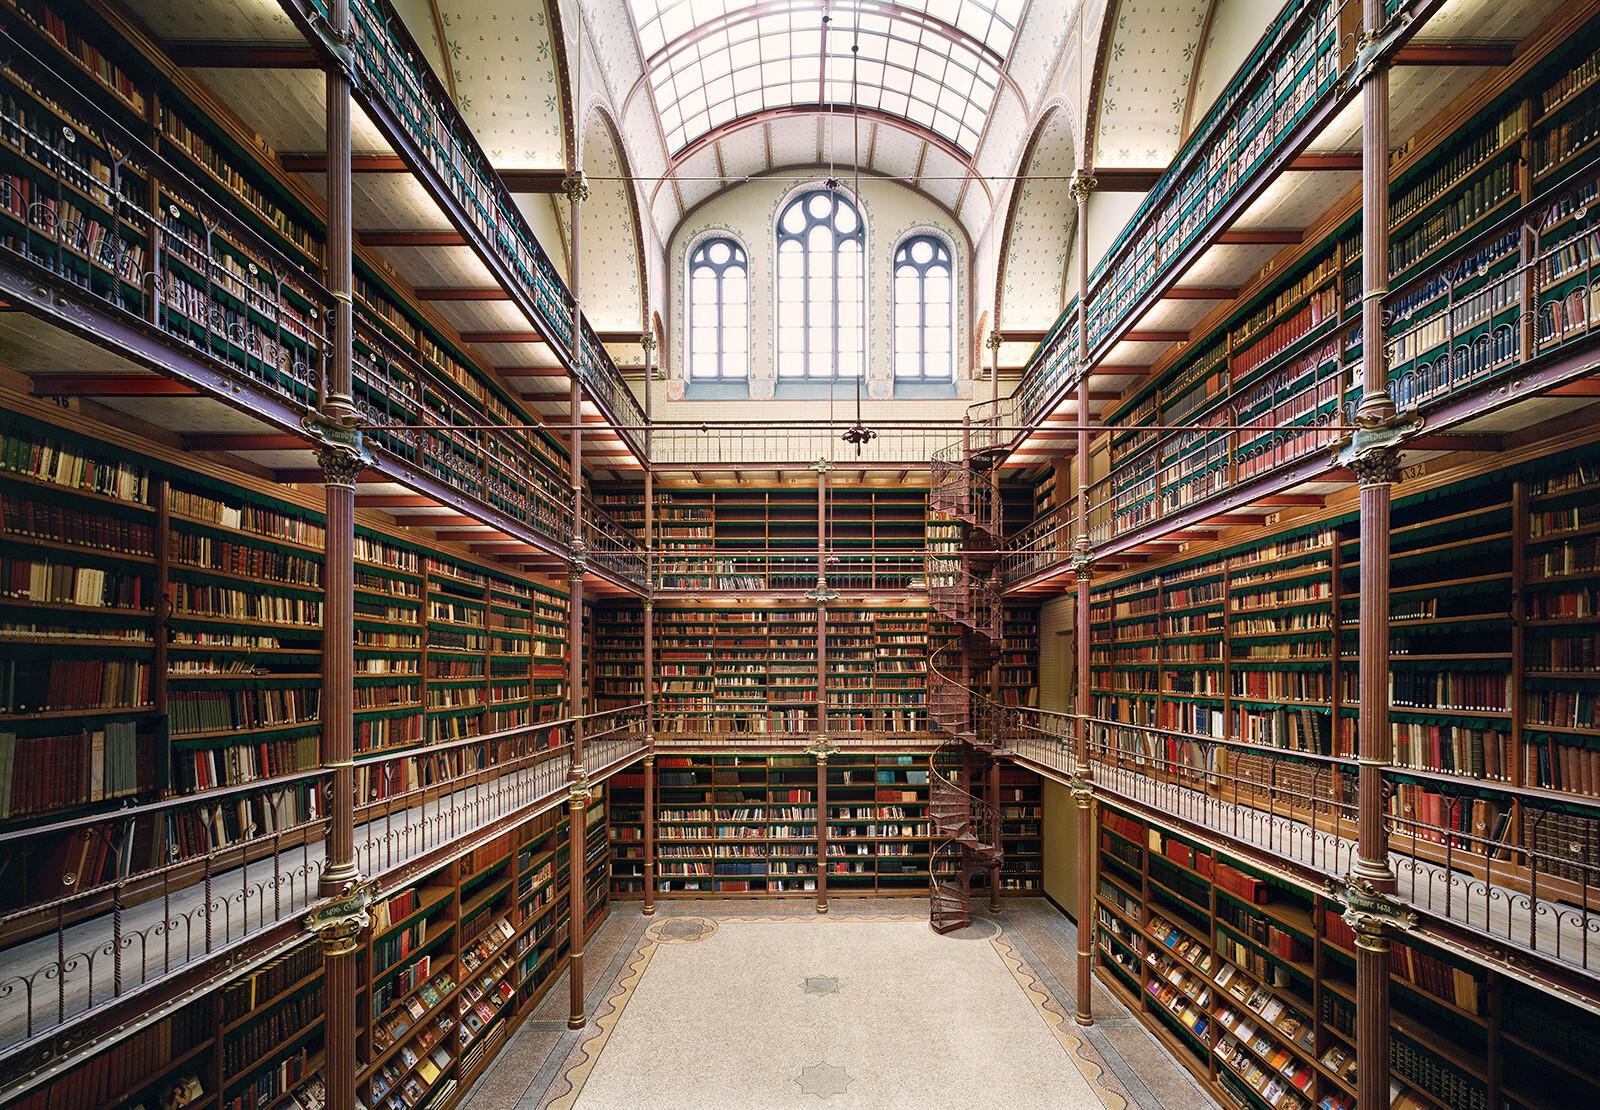 Rijksmuseum Library Amsterdam - Rafael Neff